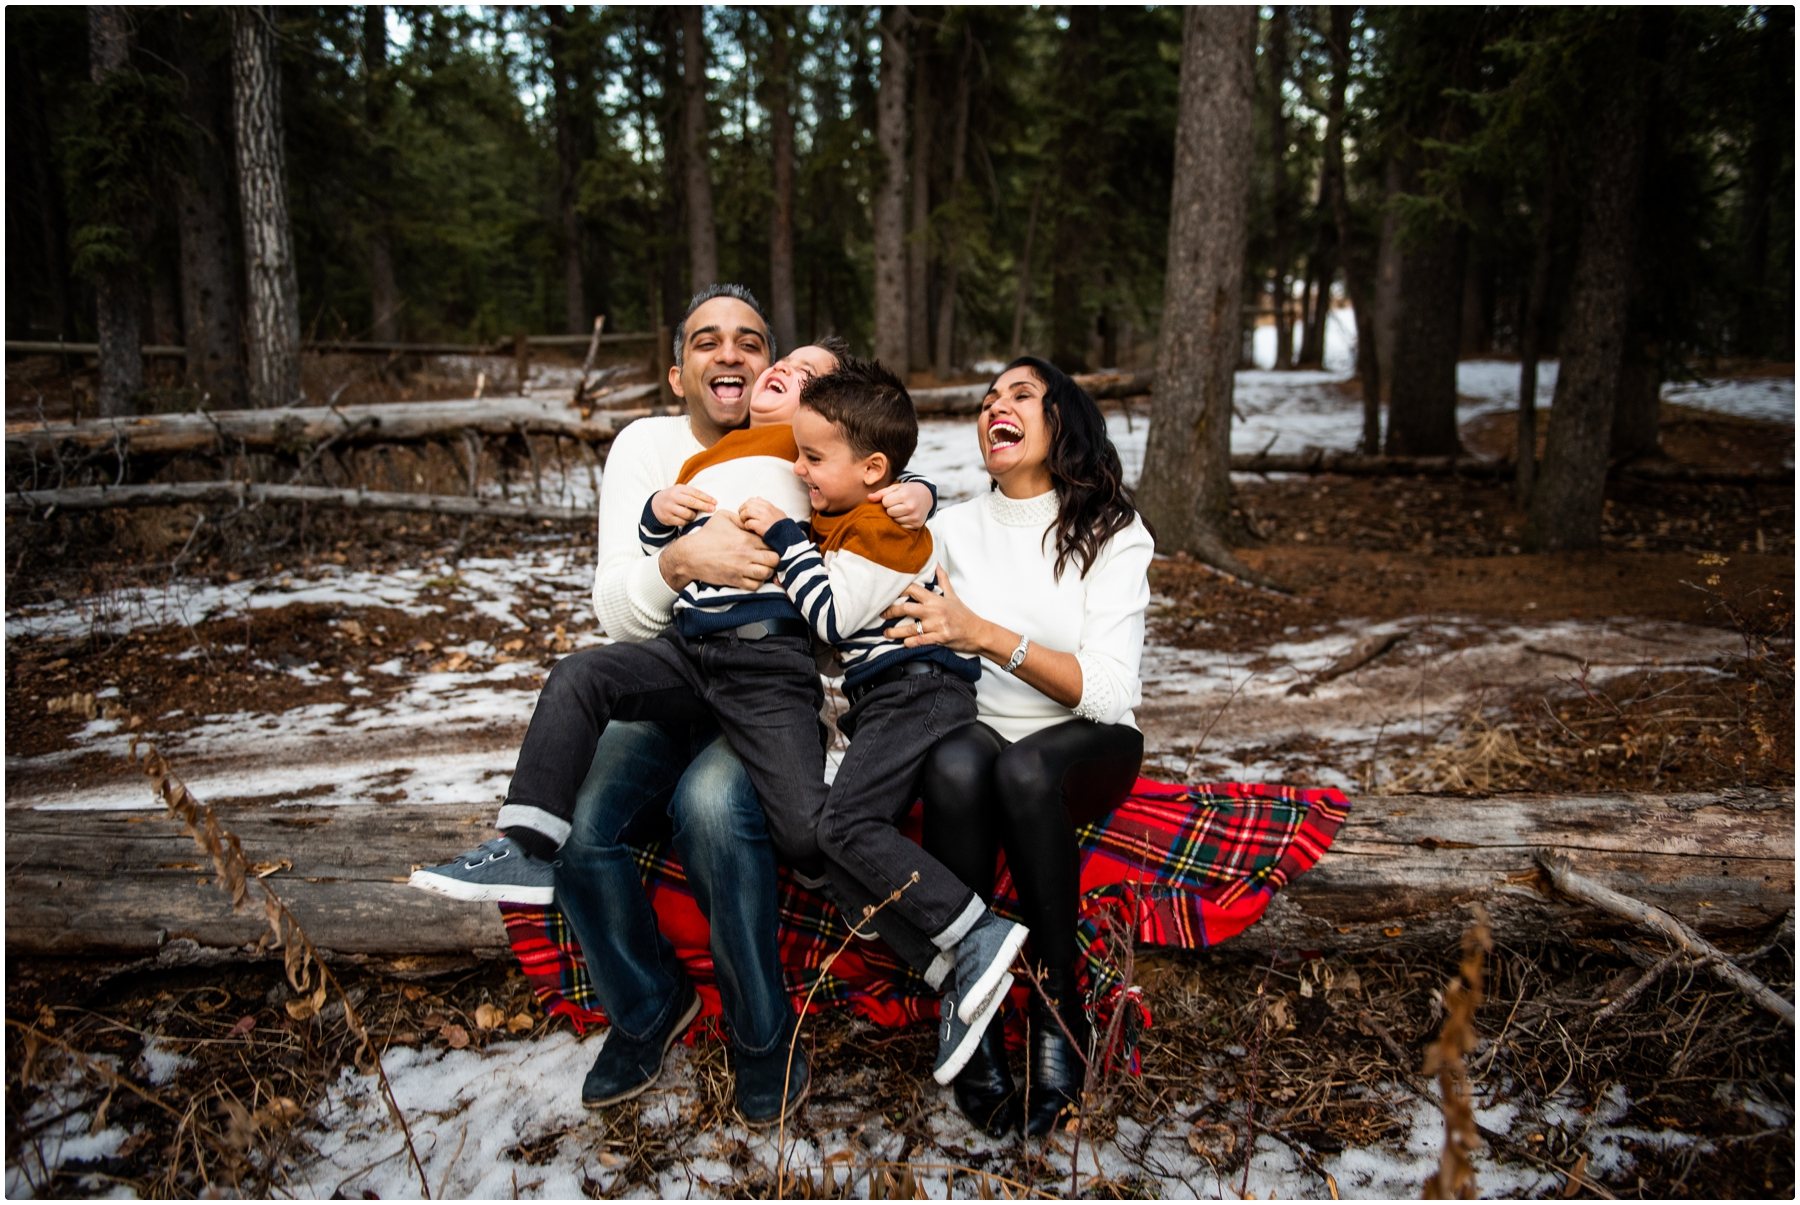 Calgary Winter Family Session Photos